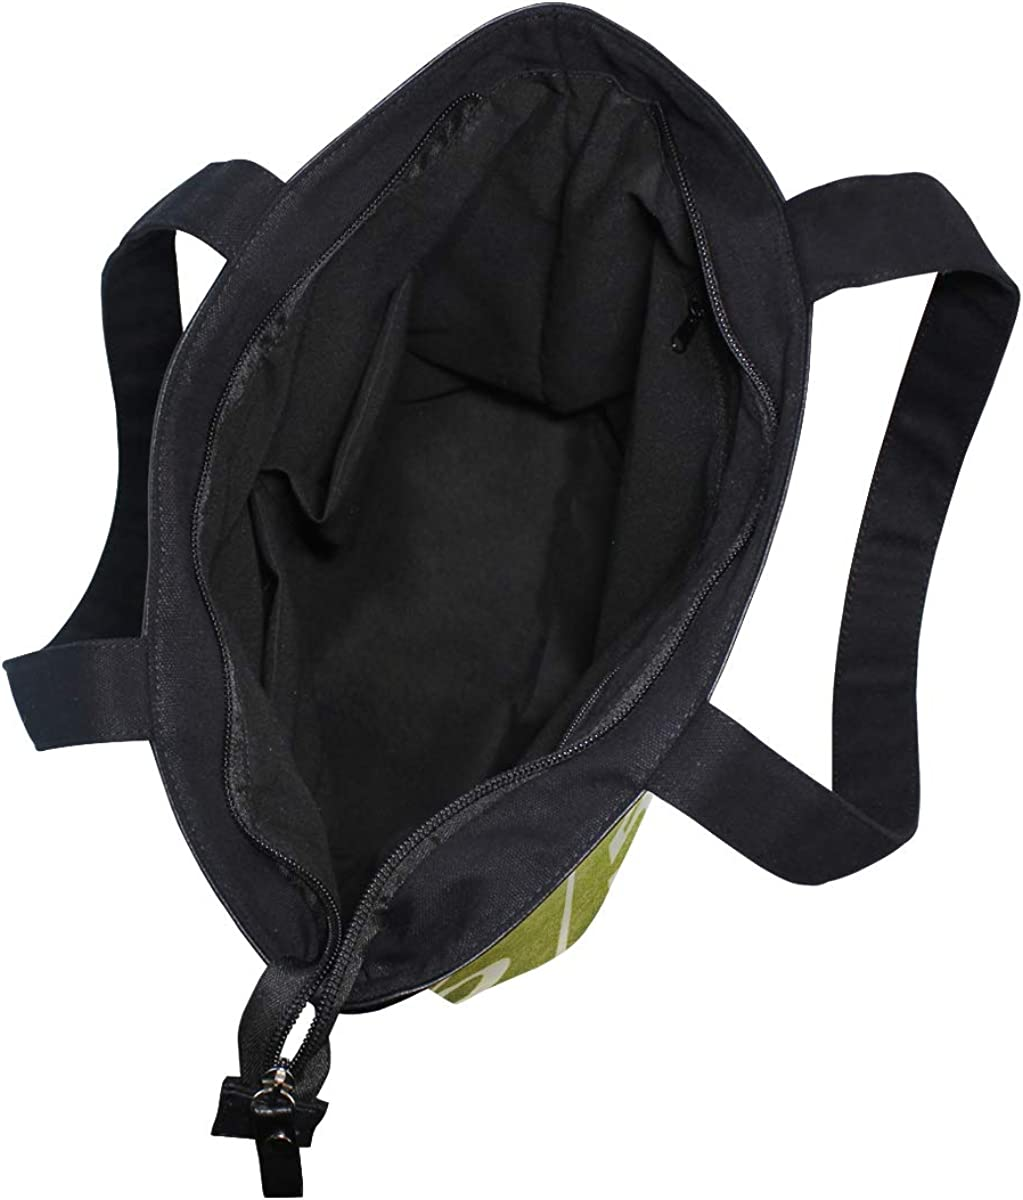 Tote Bag American Football Stadium Casual Lightweight Zip Canvas Hand Bag Top Handbag For Women Girl